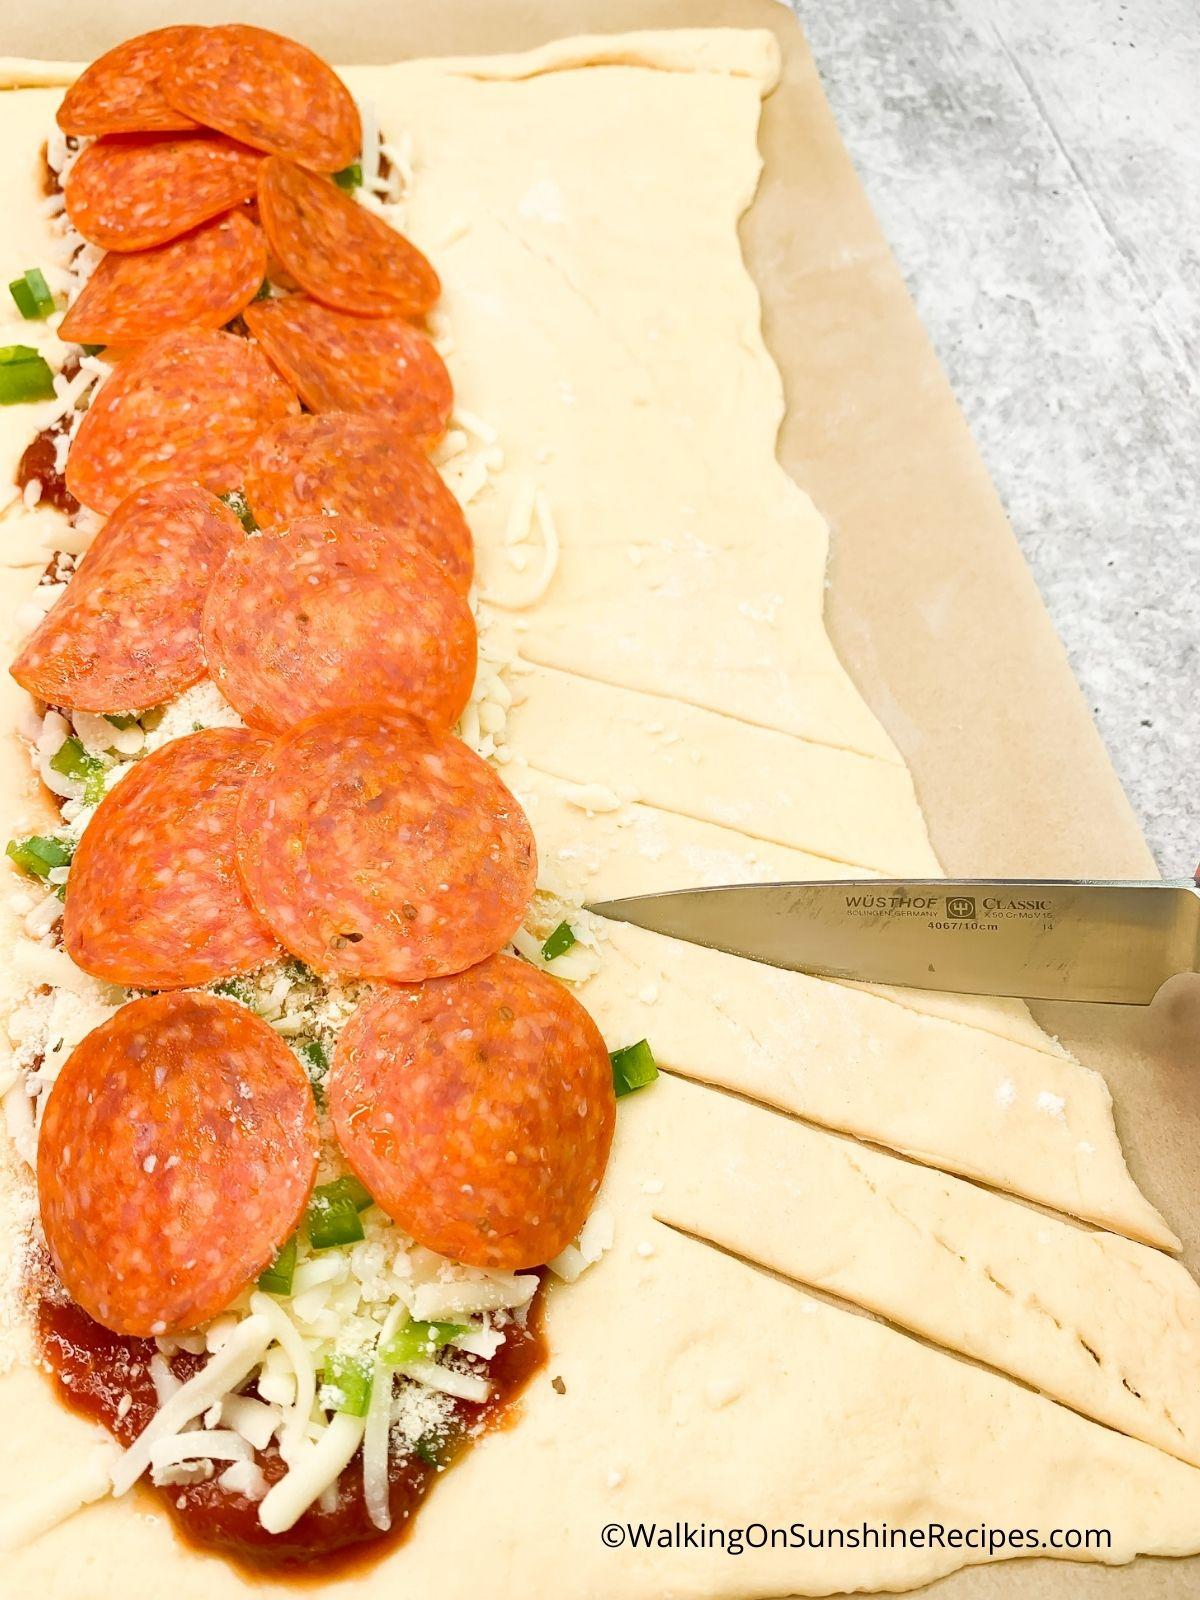 Make slices in crescent dough.